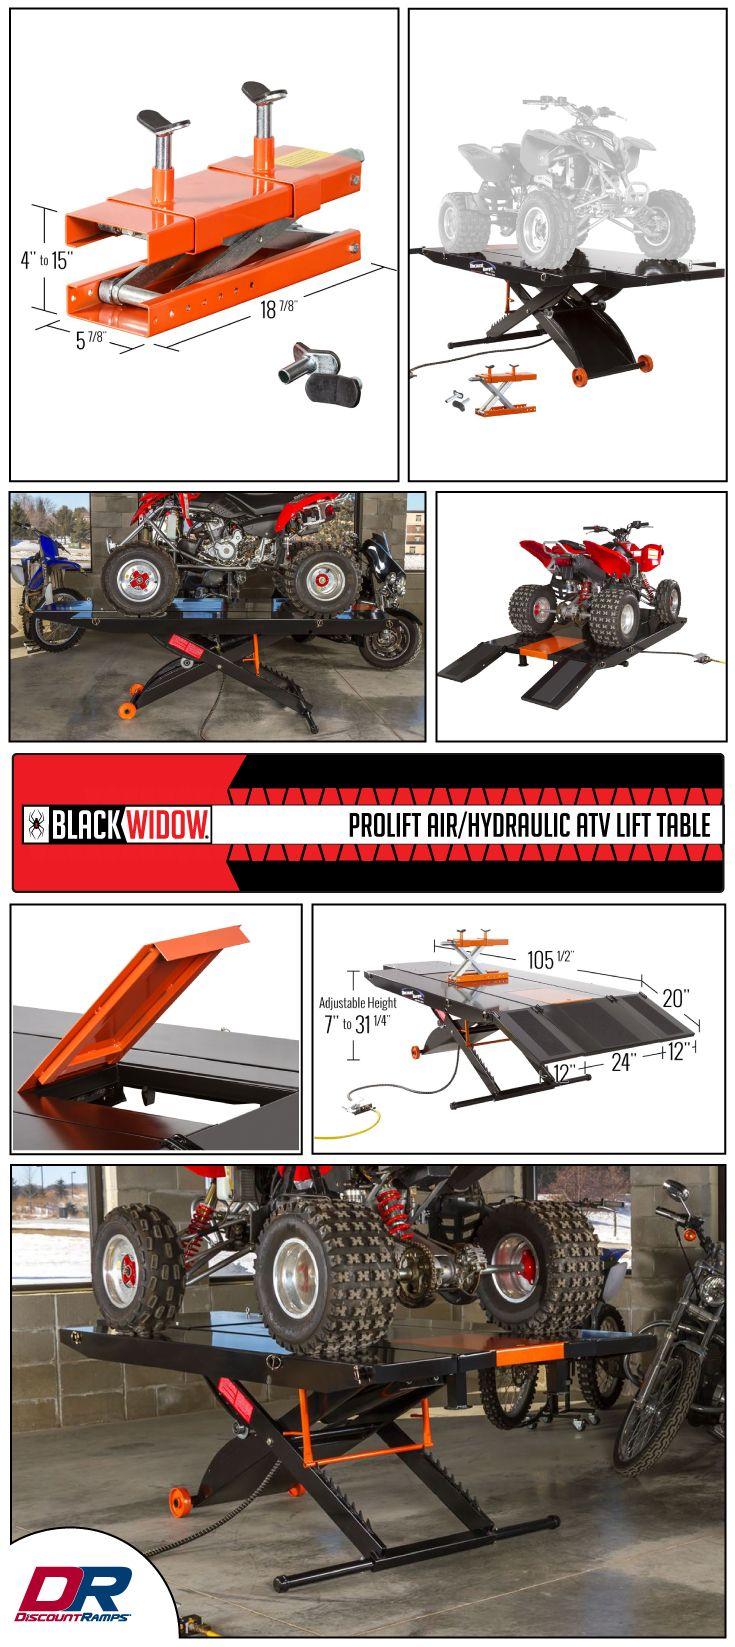 Black Widow ProLift Air/Hydraulic ATV Lift Table - 1,500 lbs